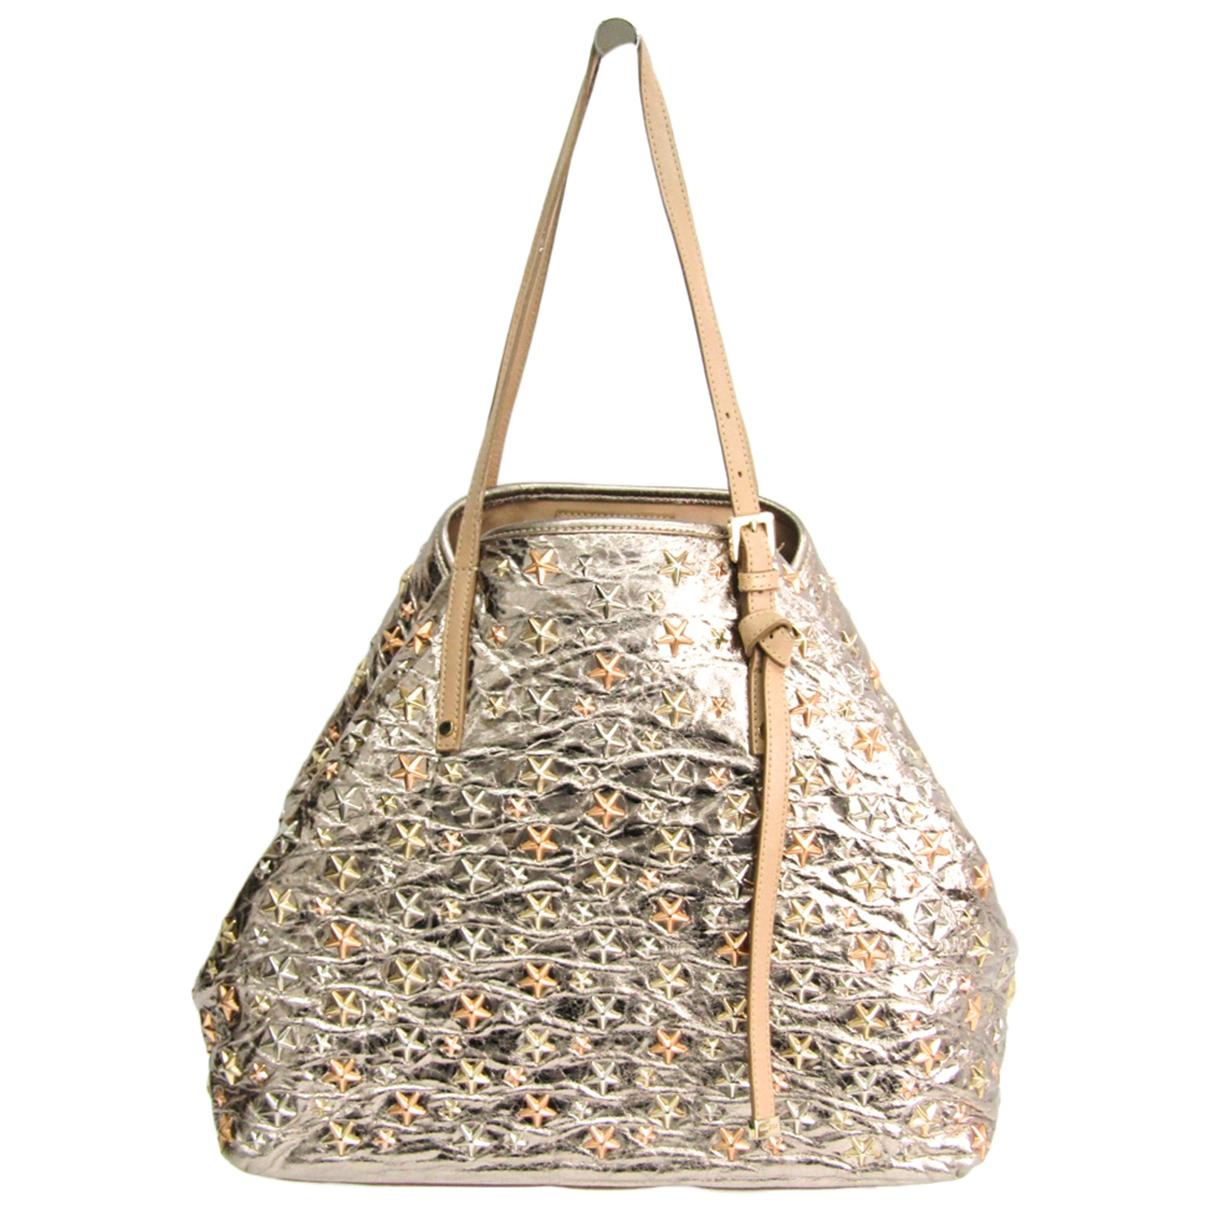 Jimmy Choo \N Gold Leather handbag for Women \N